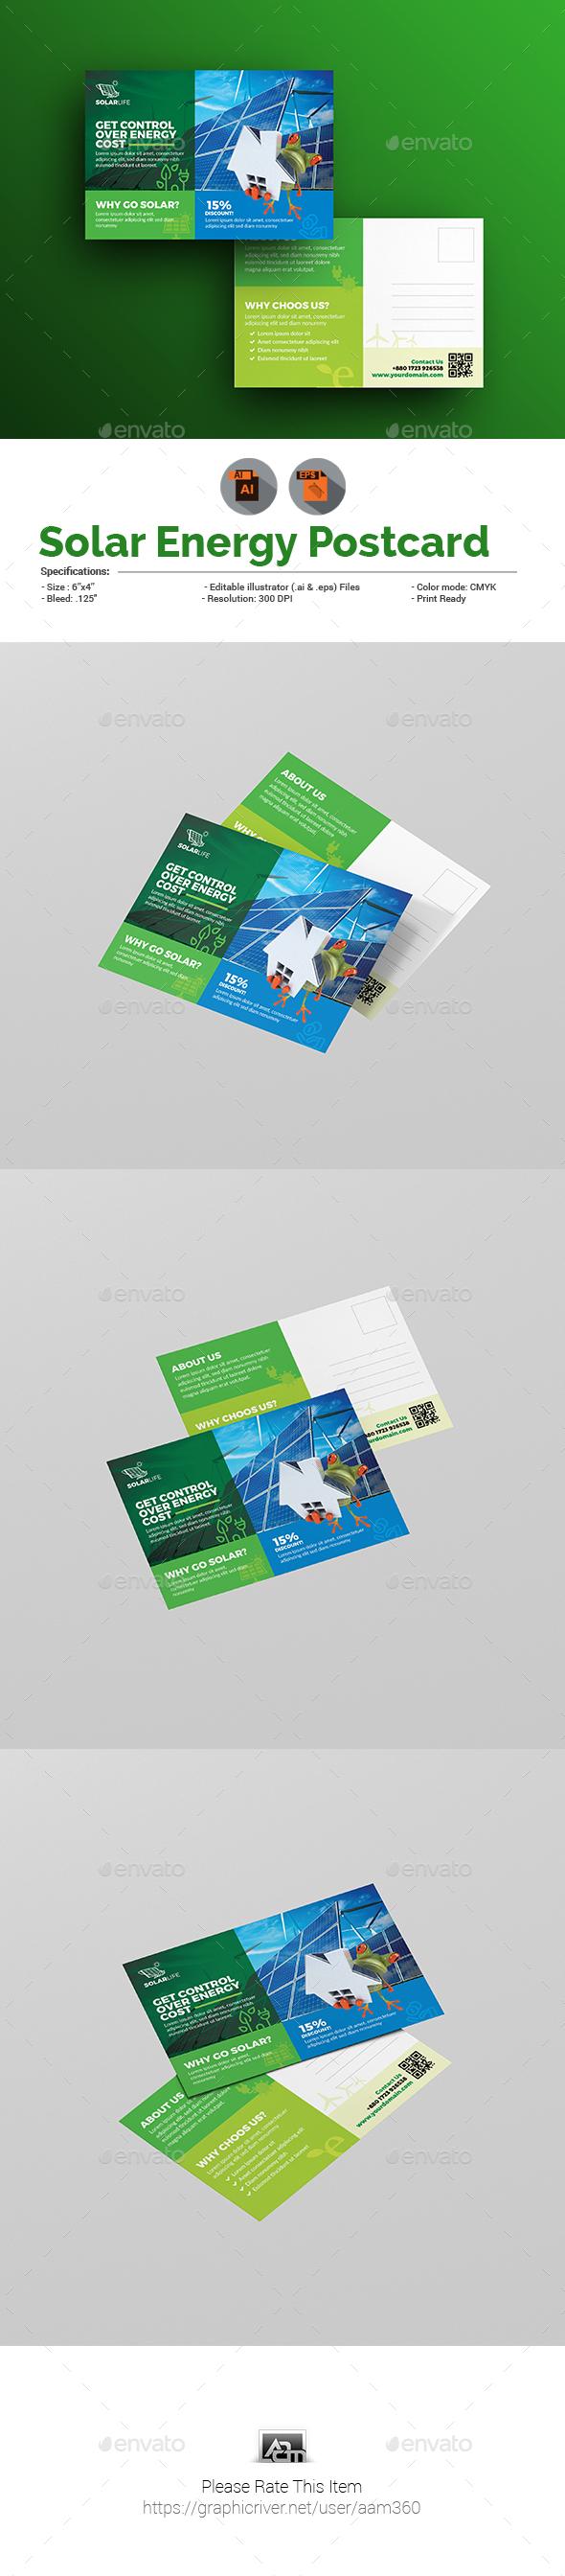 Solar Energy Postcard - Cards & Invites Print Templates